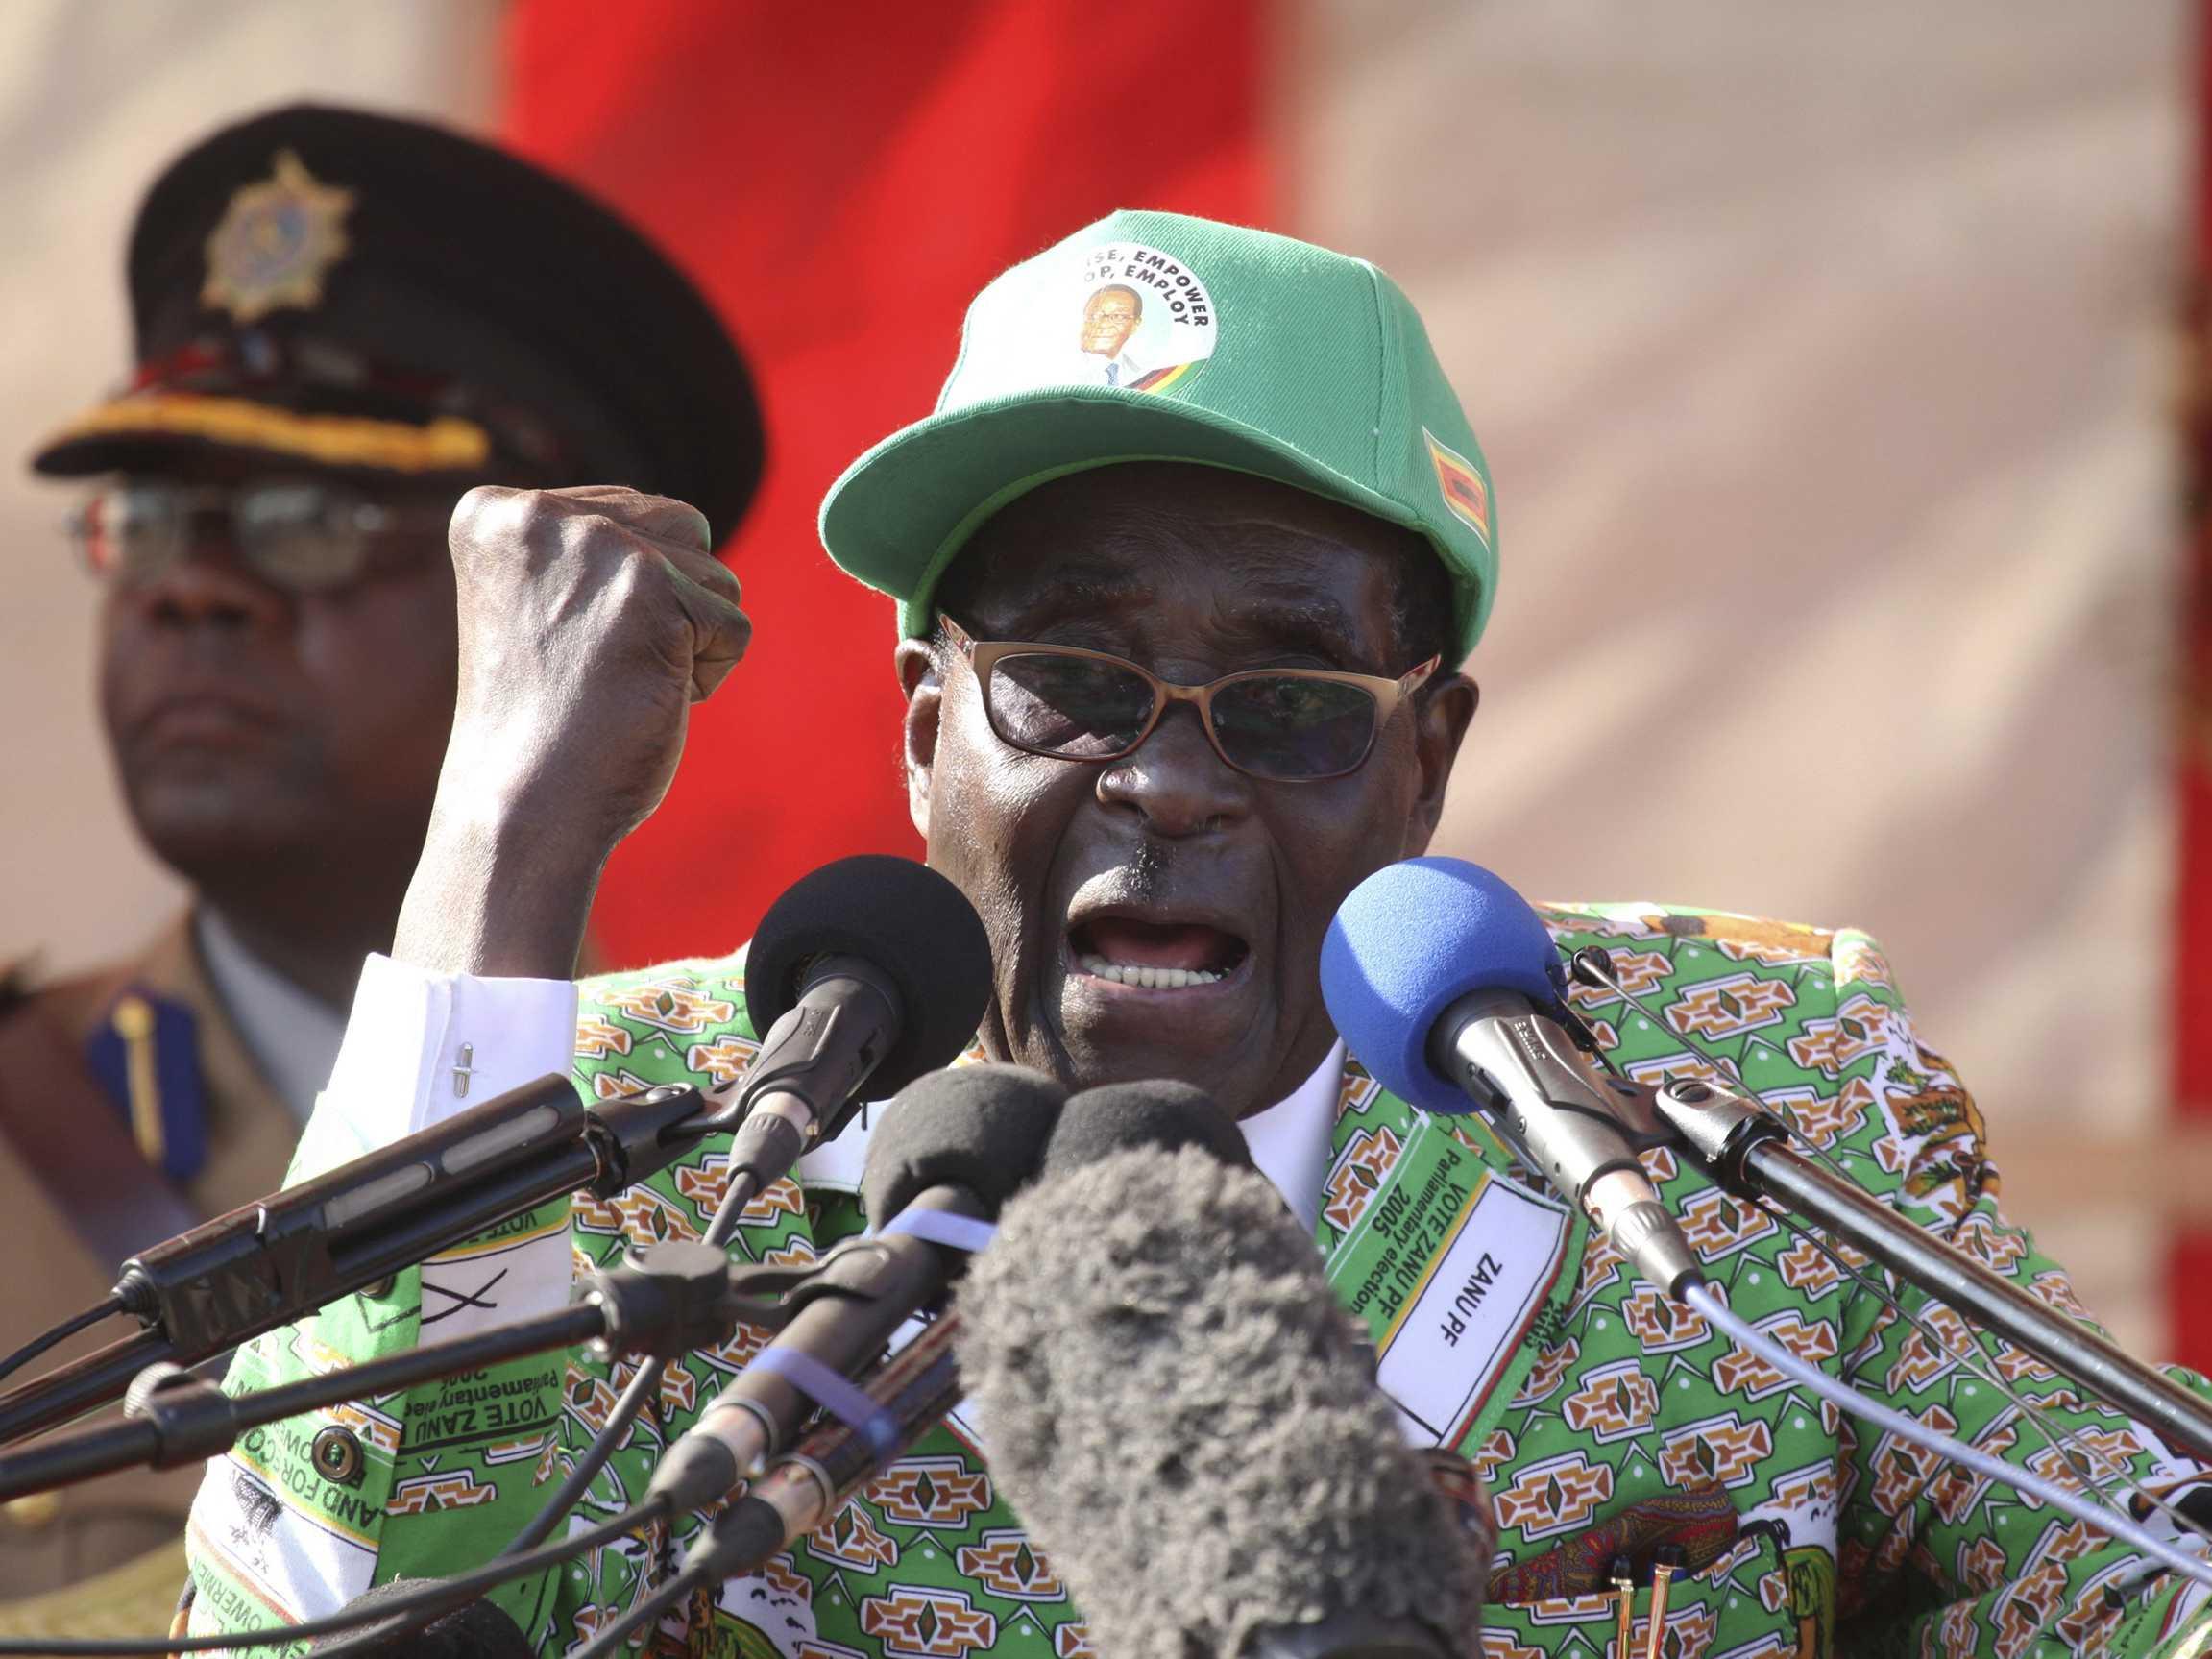 robert-mugabe-reportedly-offers-300000-reward-for-identity-of-anonymous-mole-revealing-zimbabwes-secrets (1)